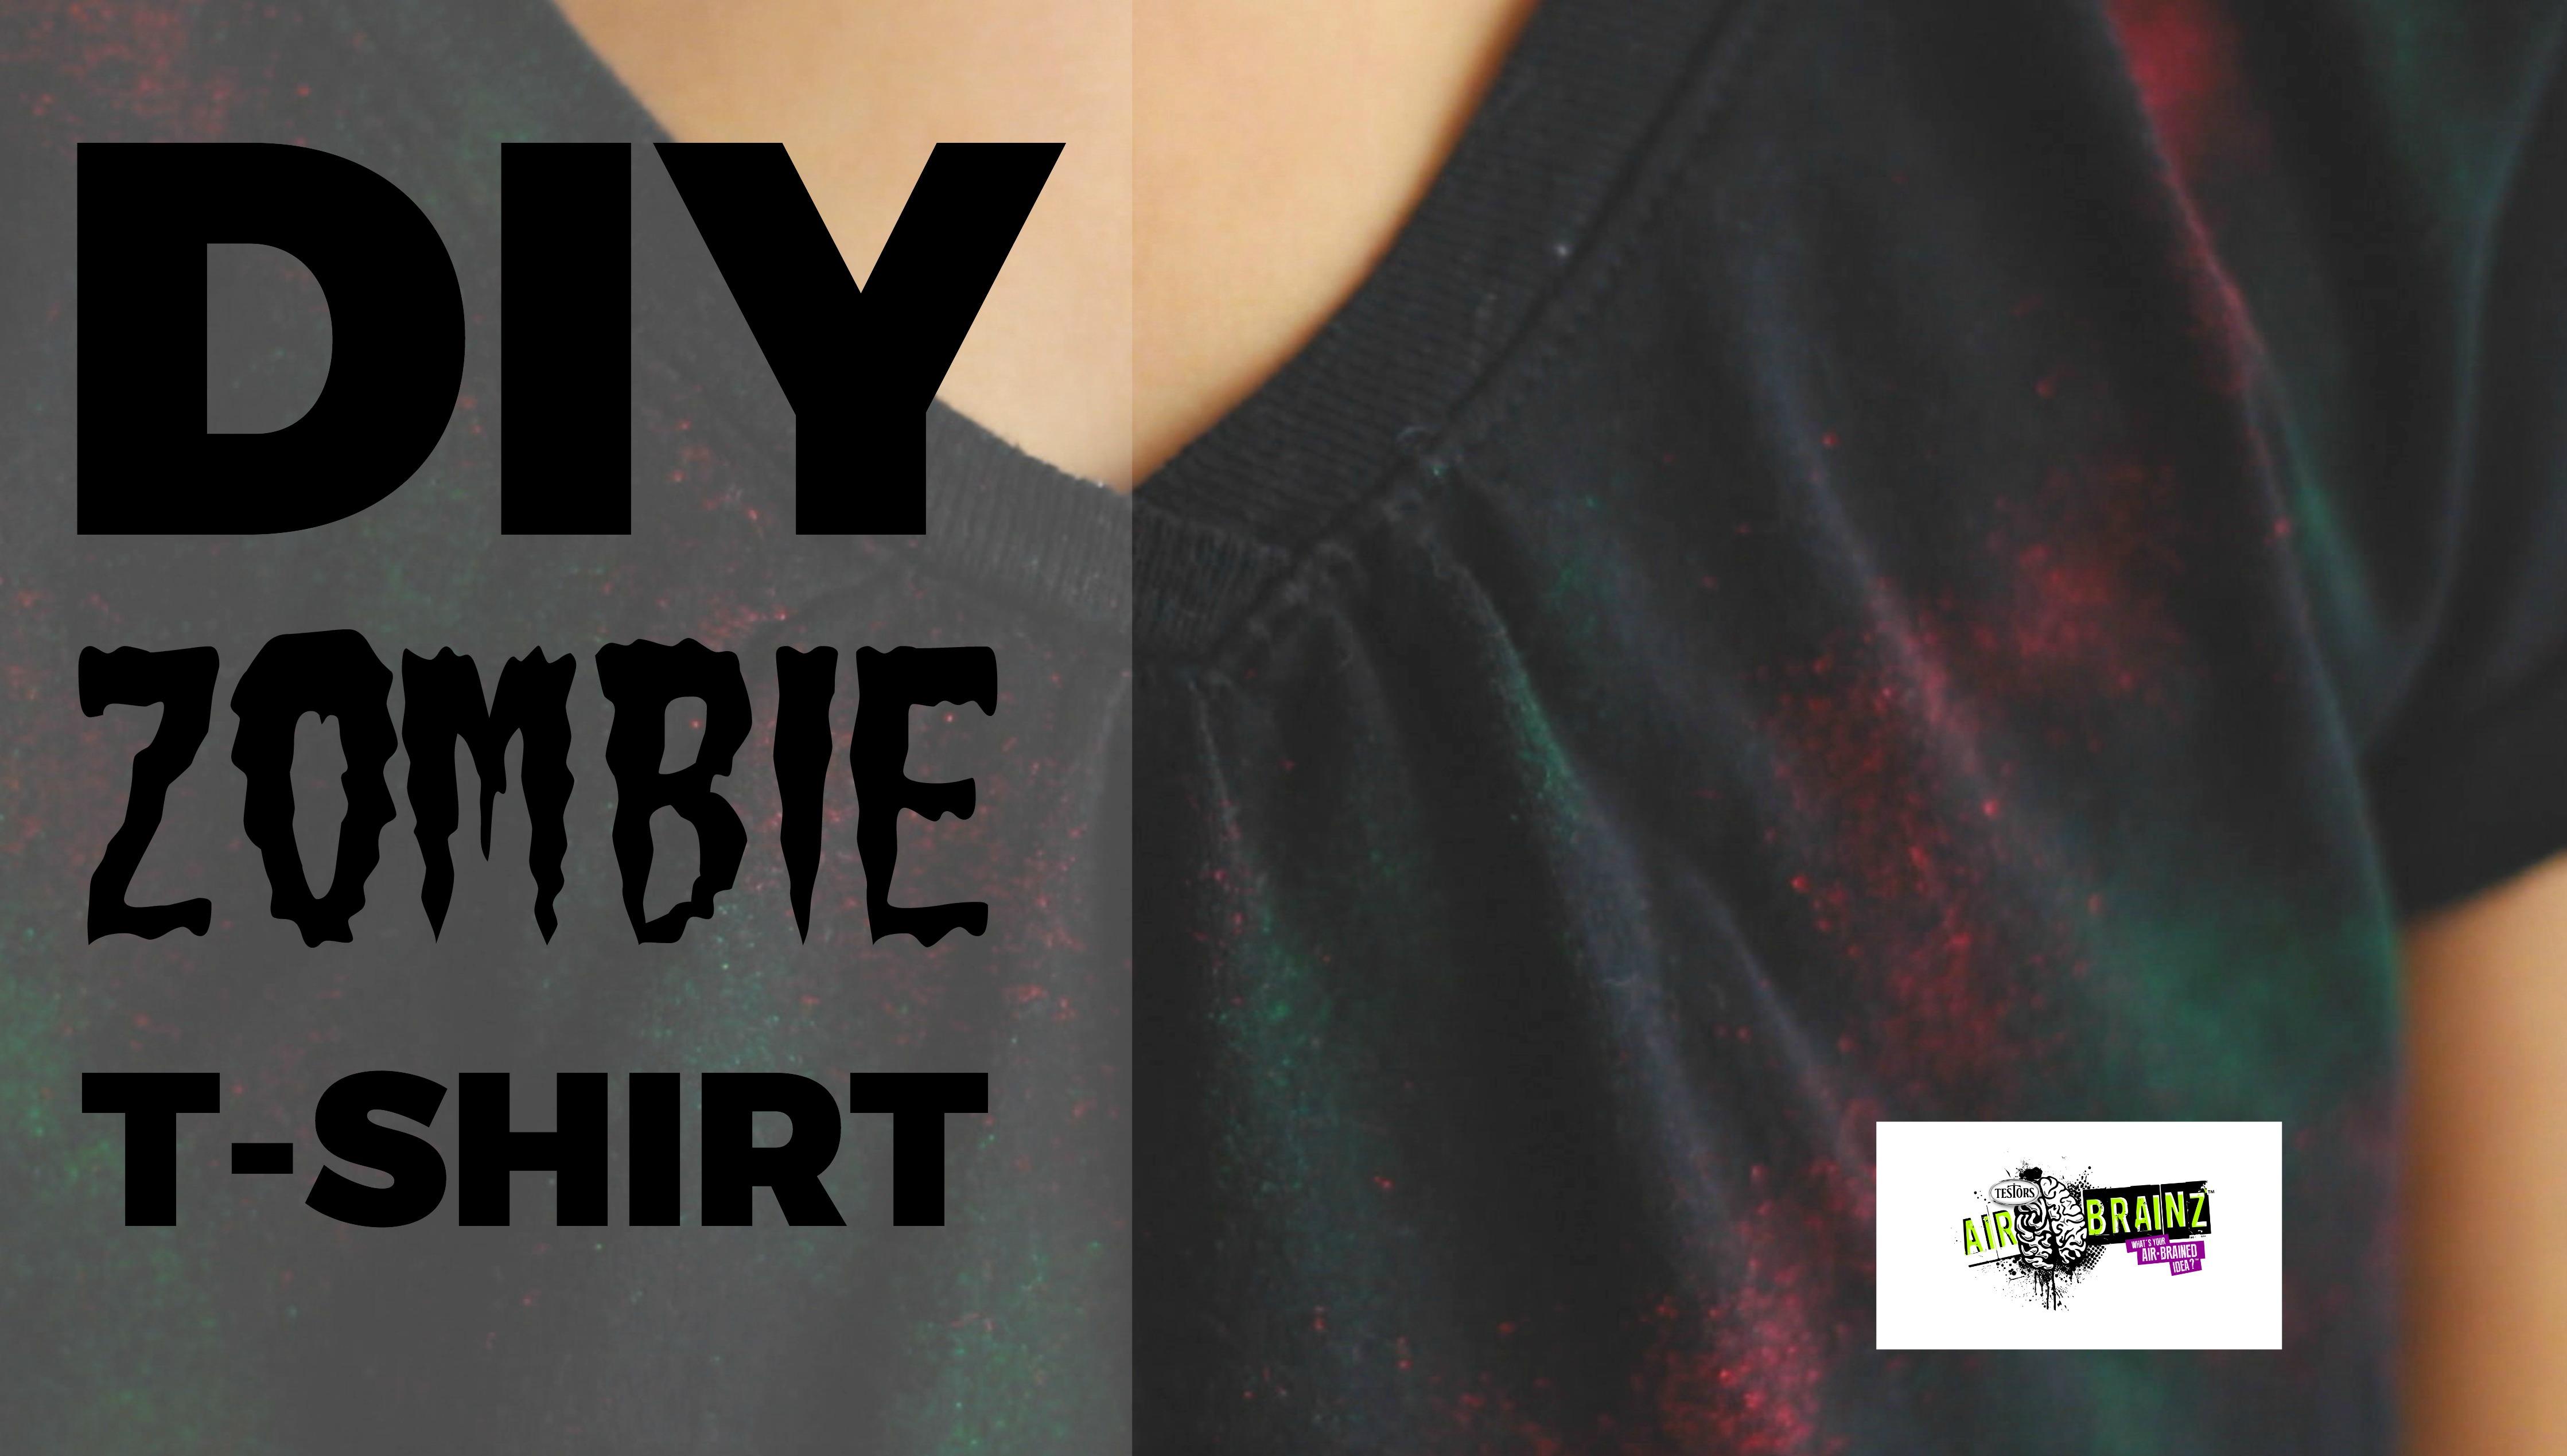 DIY Zombie T-shirt